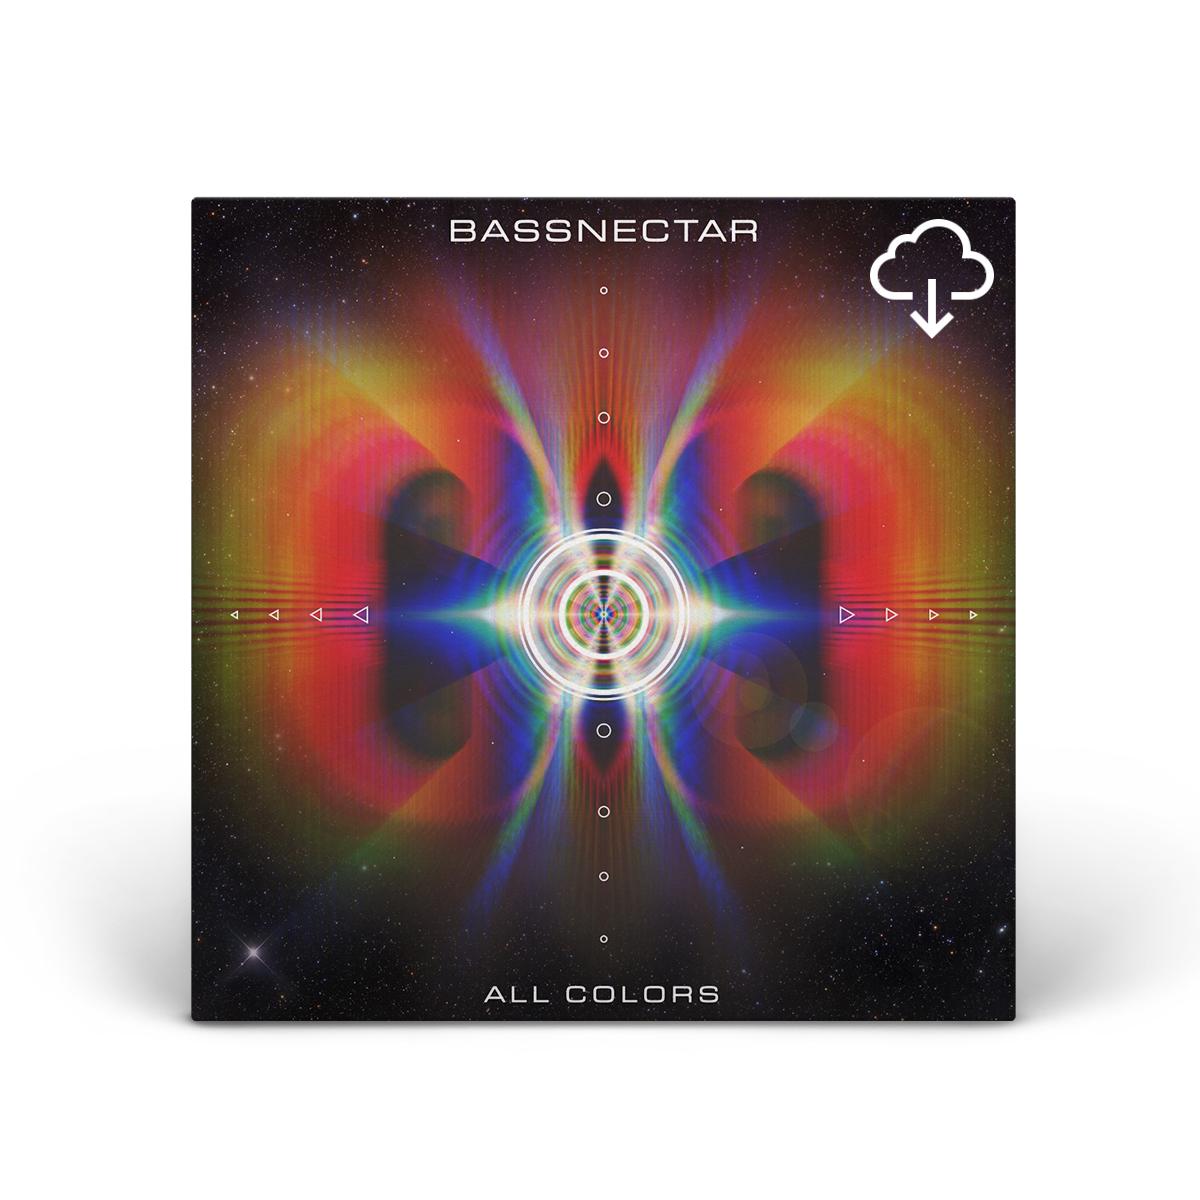 All Colors single: Rise & Shine